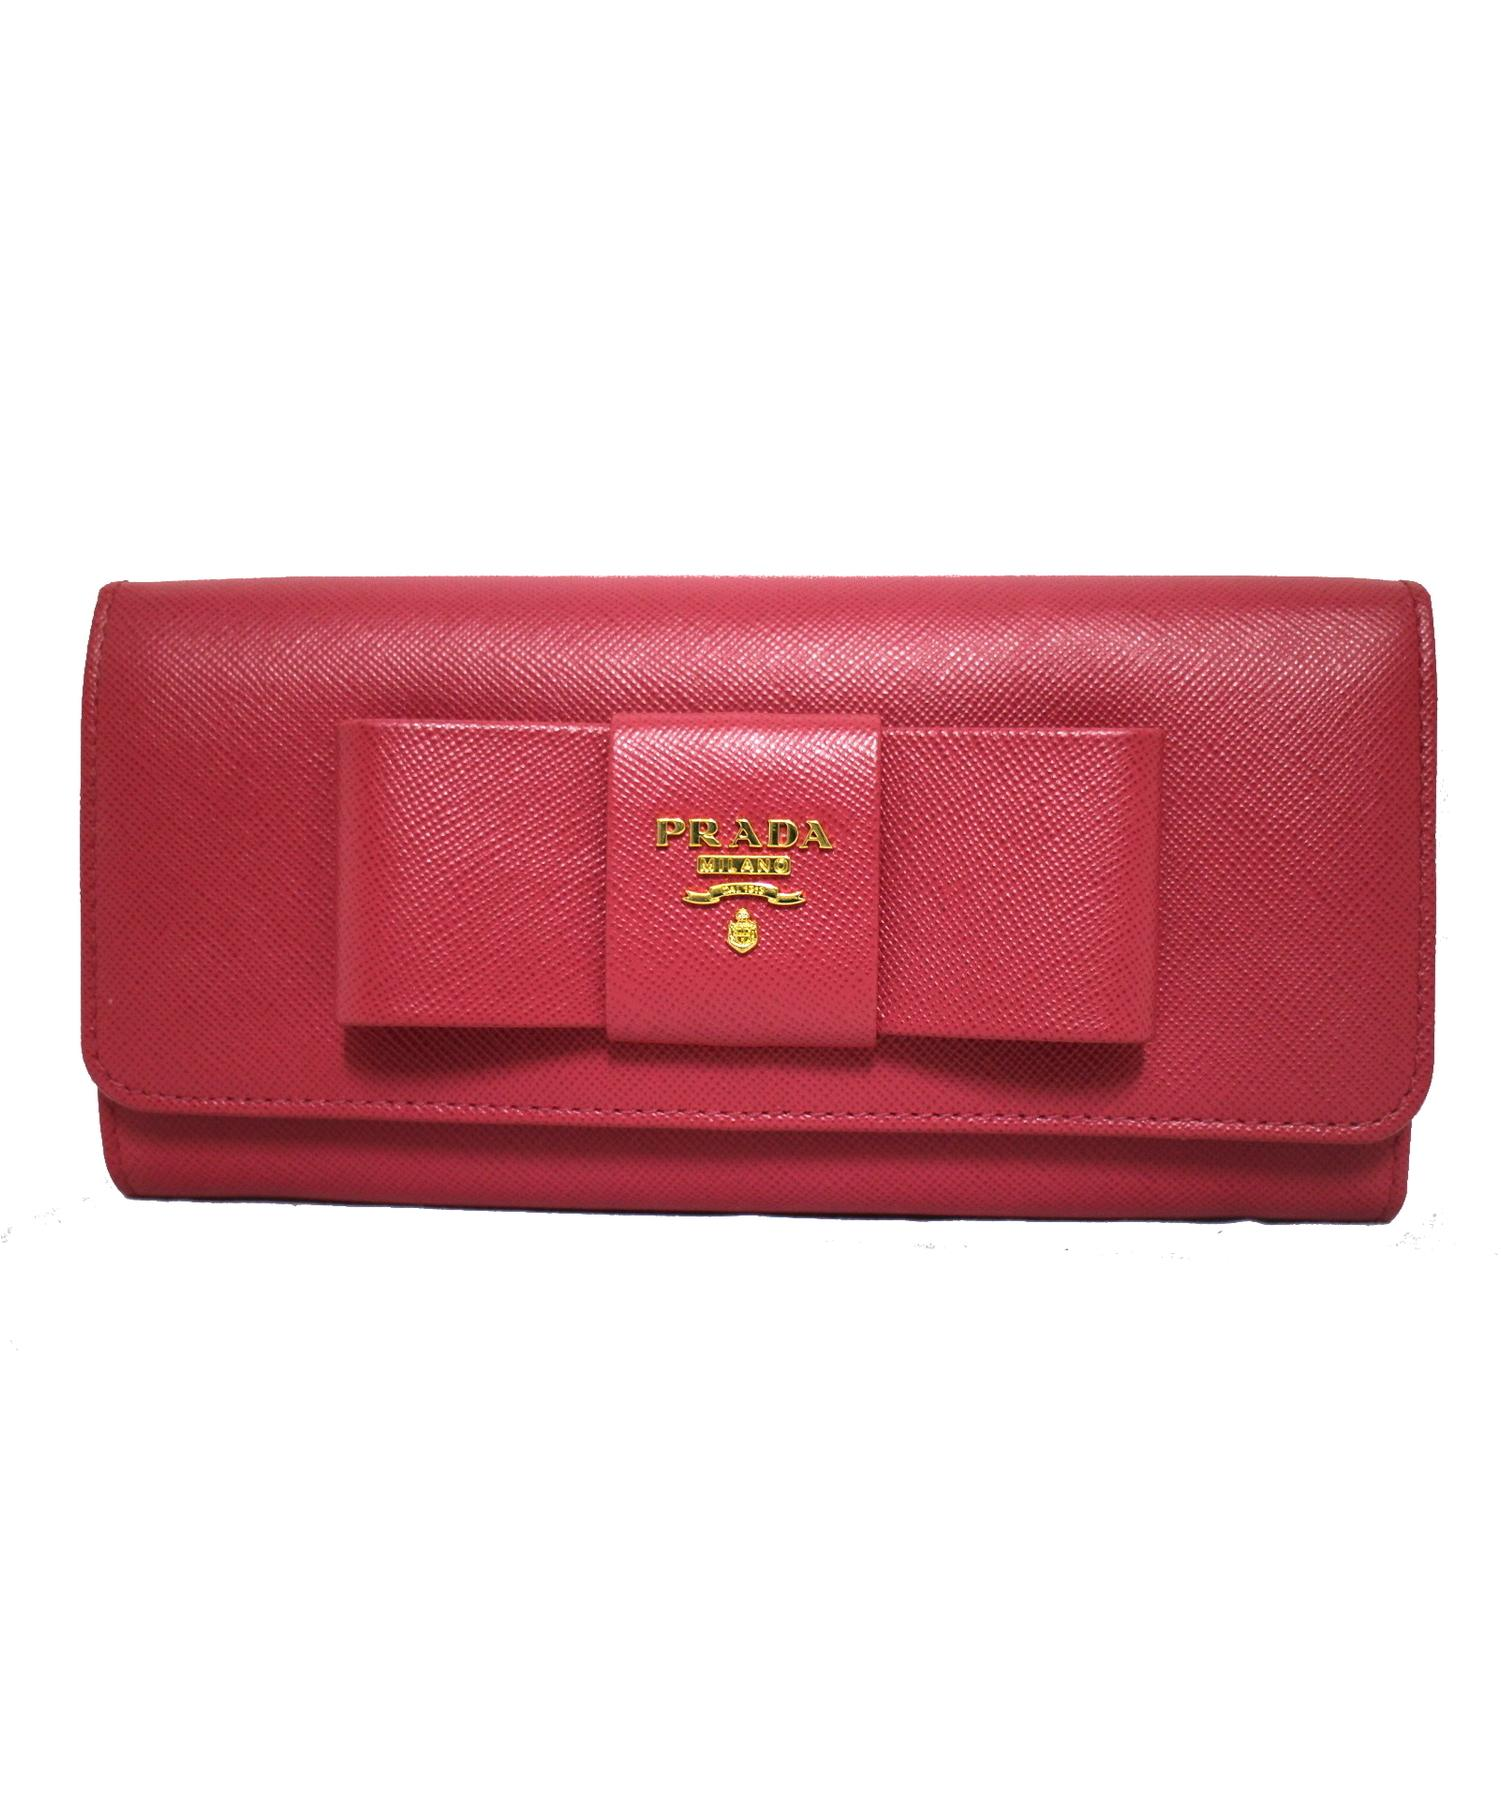 new styles ac915 96e3b [中古]PRADA(プラダ)のレディース 服飾小物 リボンフラップ長財布